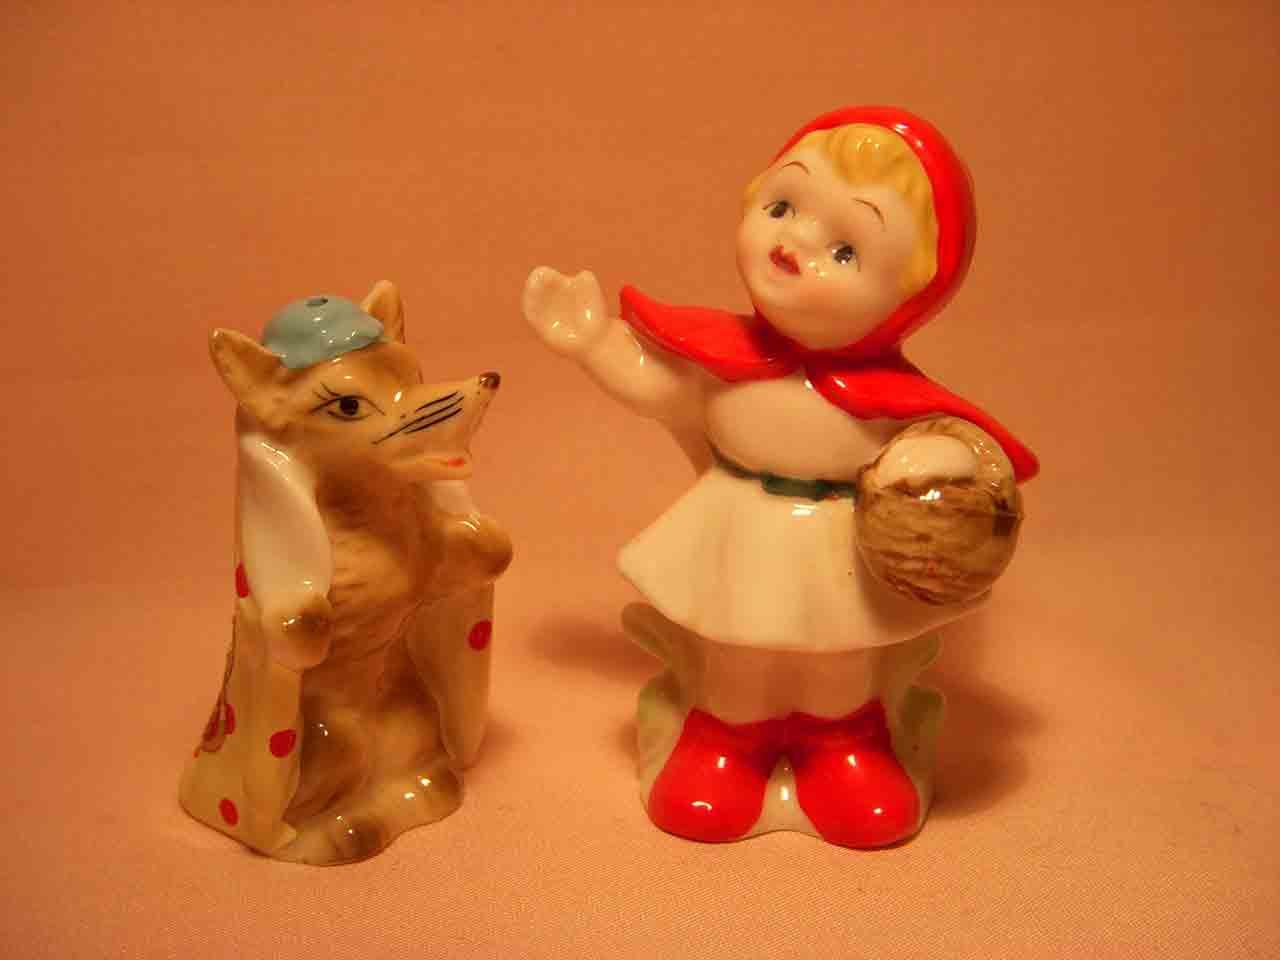 Miniature Bone China Little Red Riding Hood nursery rhyme salt and pepper shaker